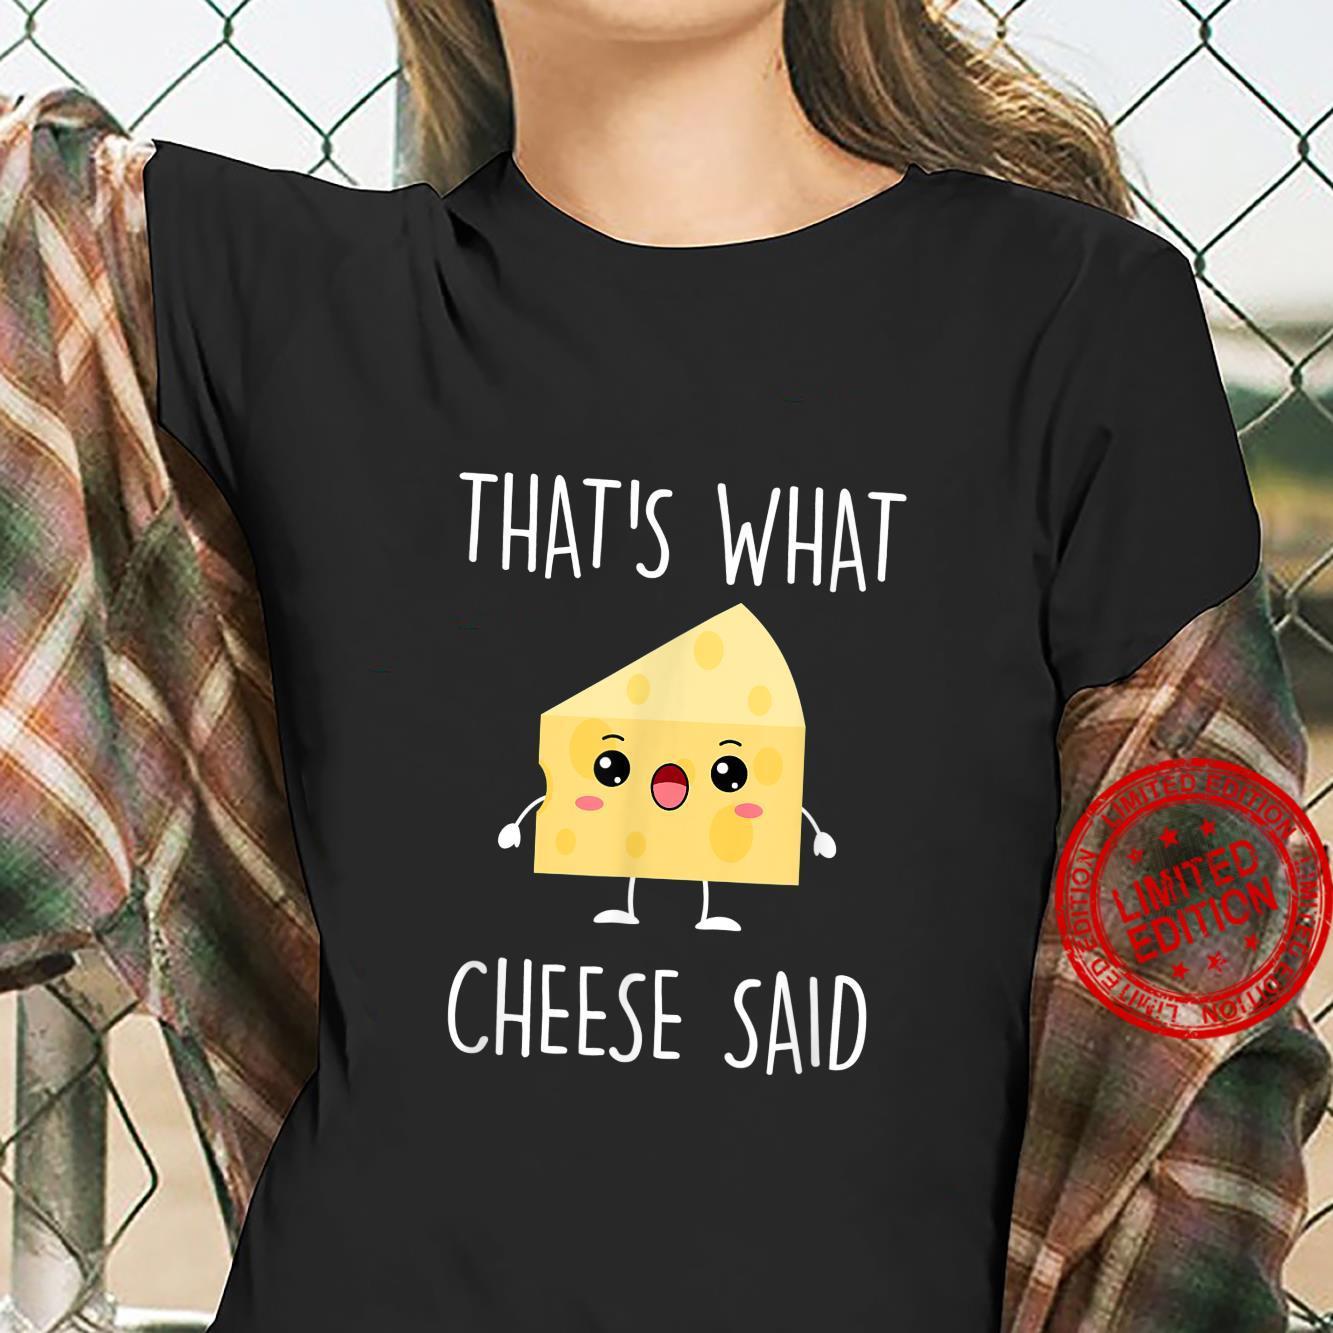 Cheese Pun Shirt, That's What Cheese Said Shirt ladies tee